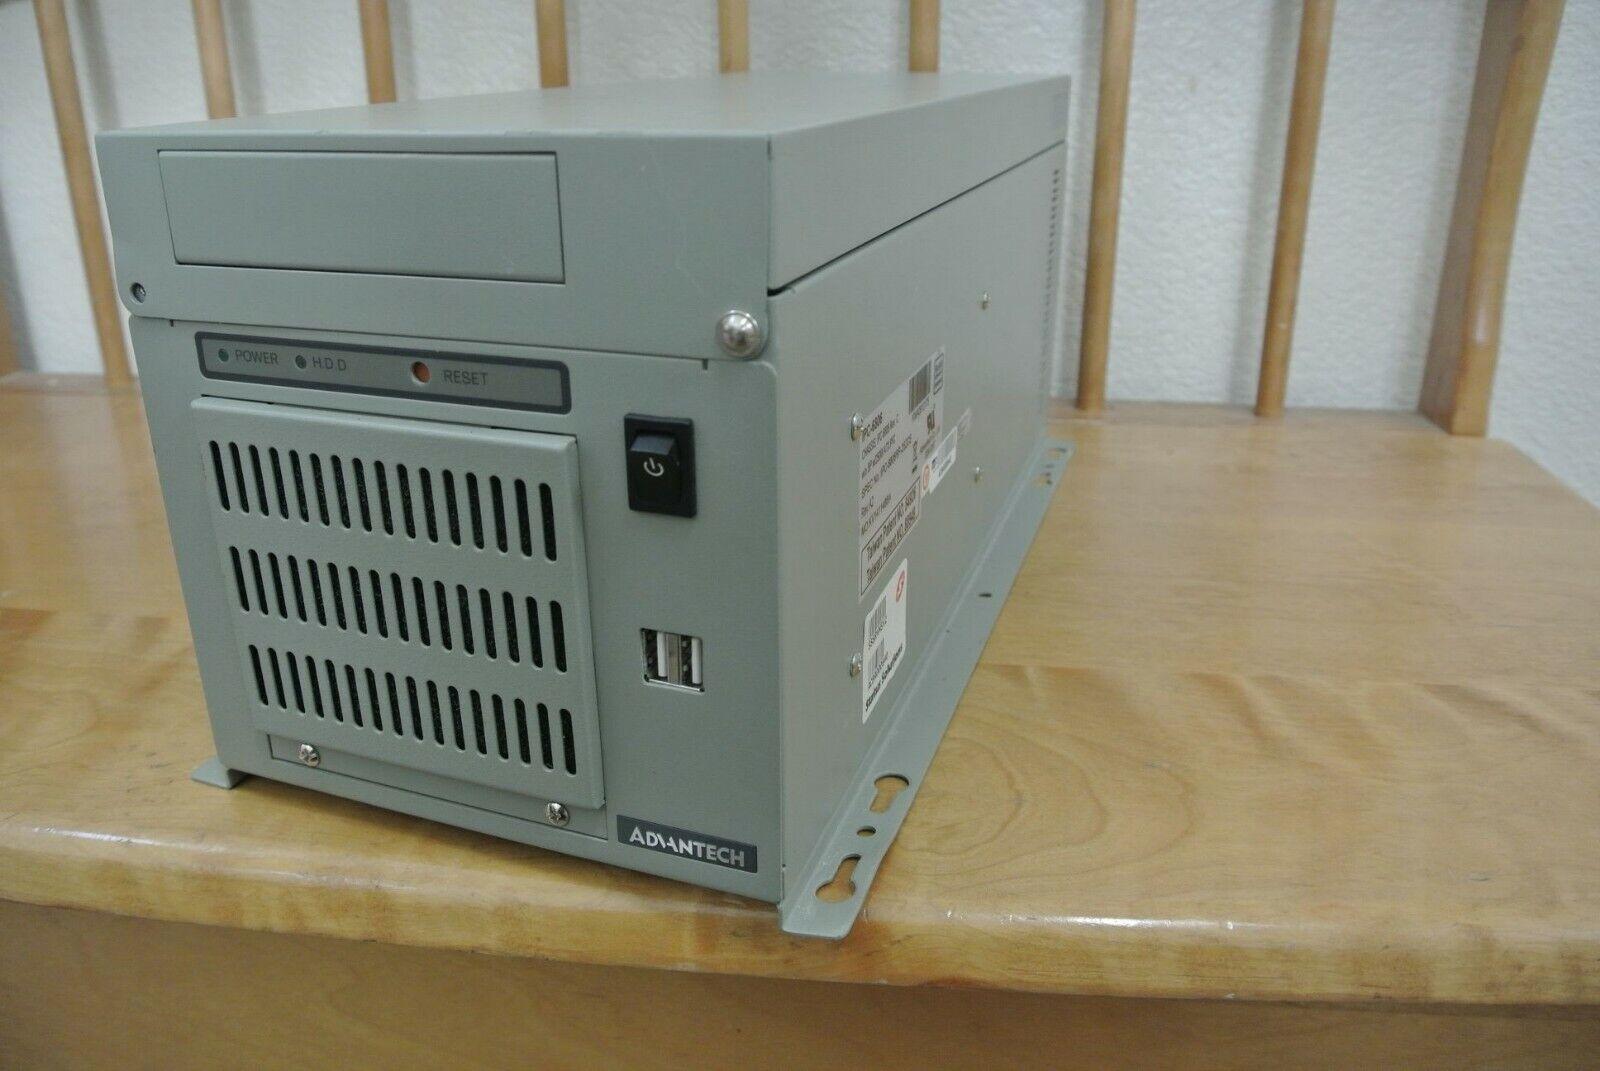 ADVANTECH IPC-6806 6-SLOT INDUSTRIAL COMPUTER 2.80GHZ W/PCA-6106P4 6010VG